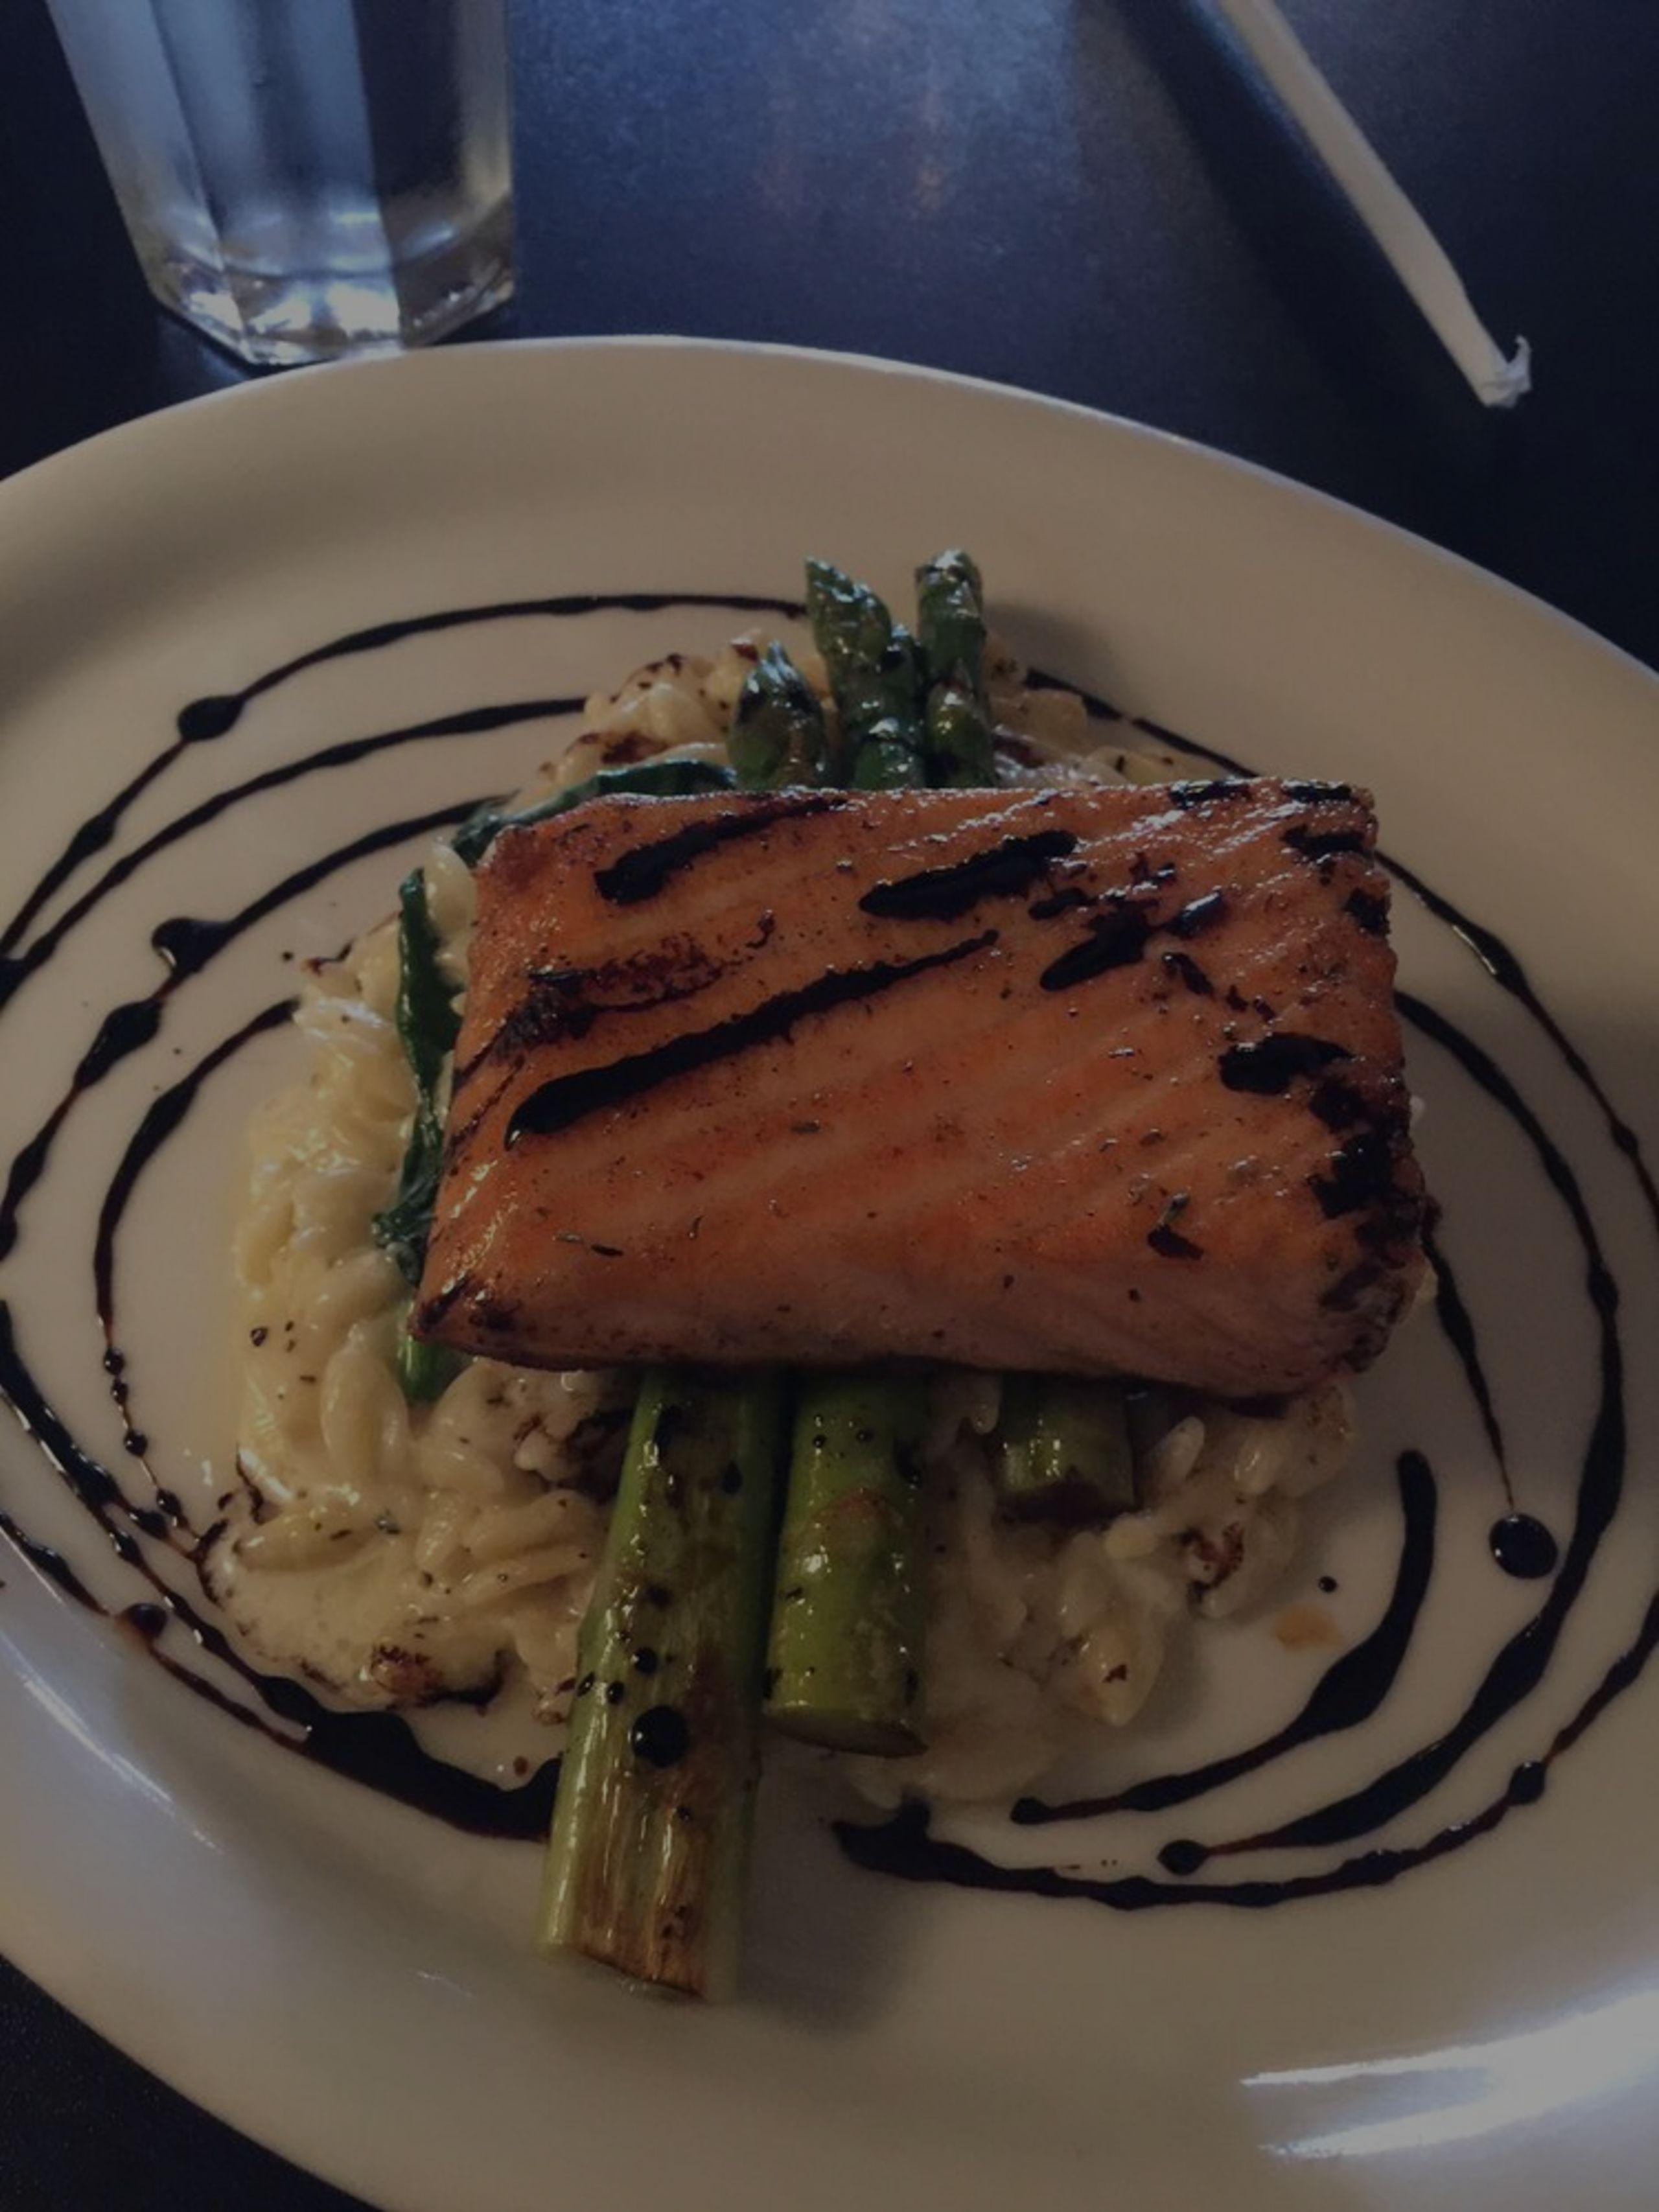 The Best Restaurants in Fairhope AL